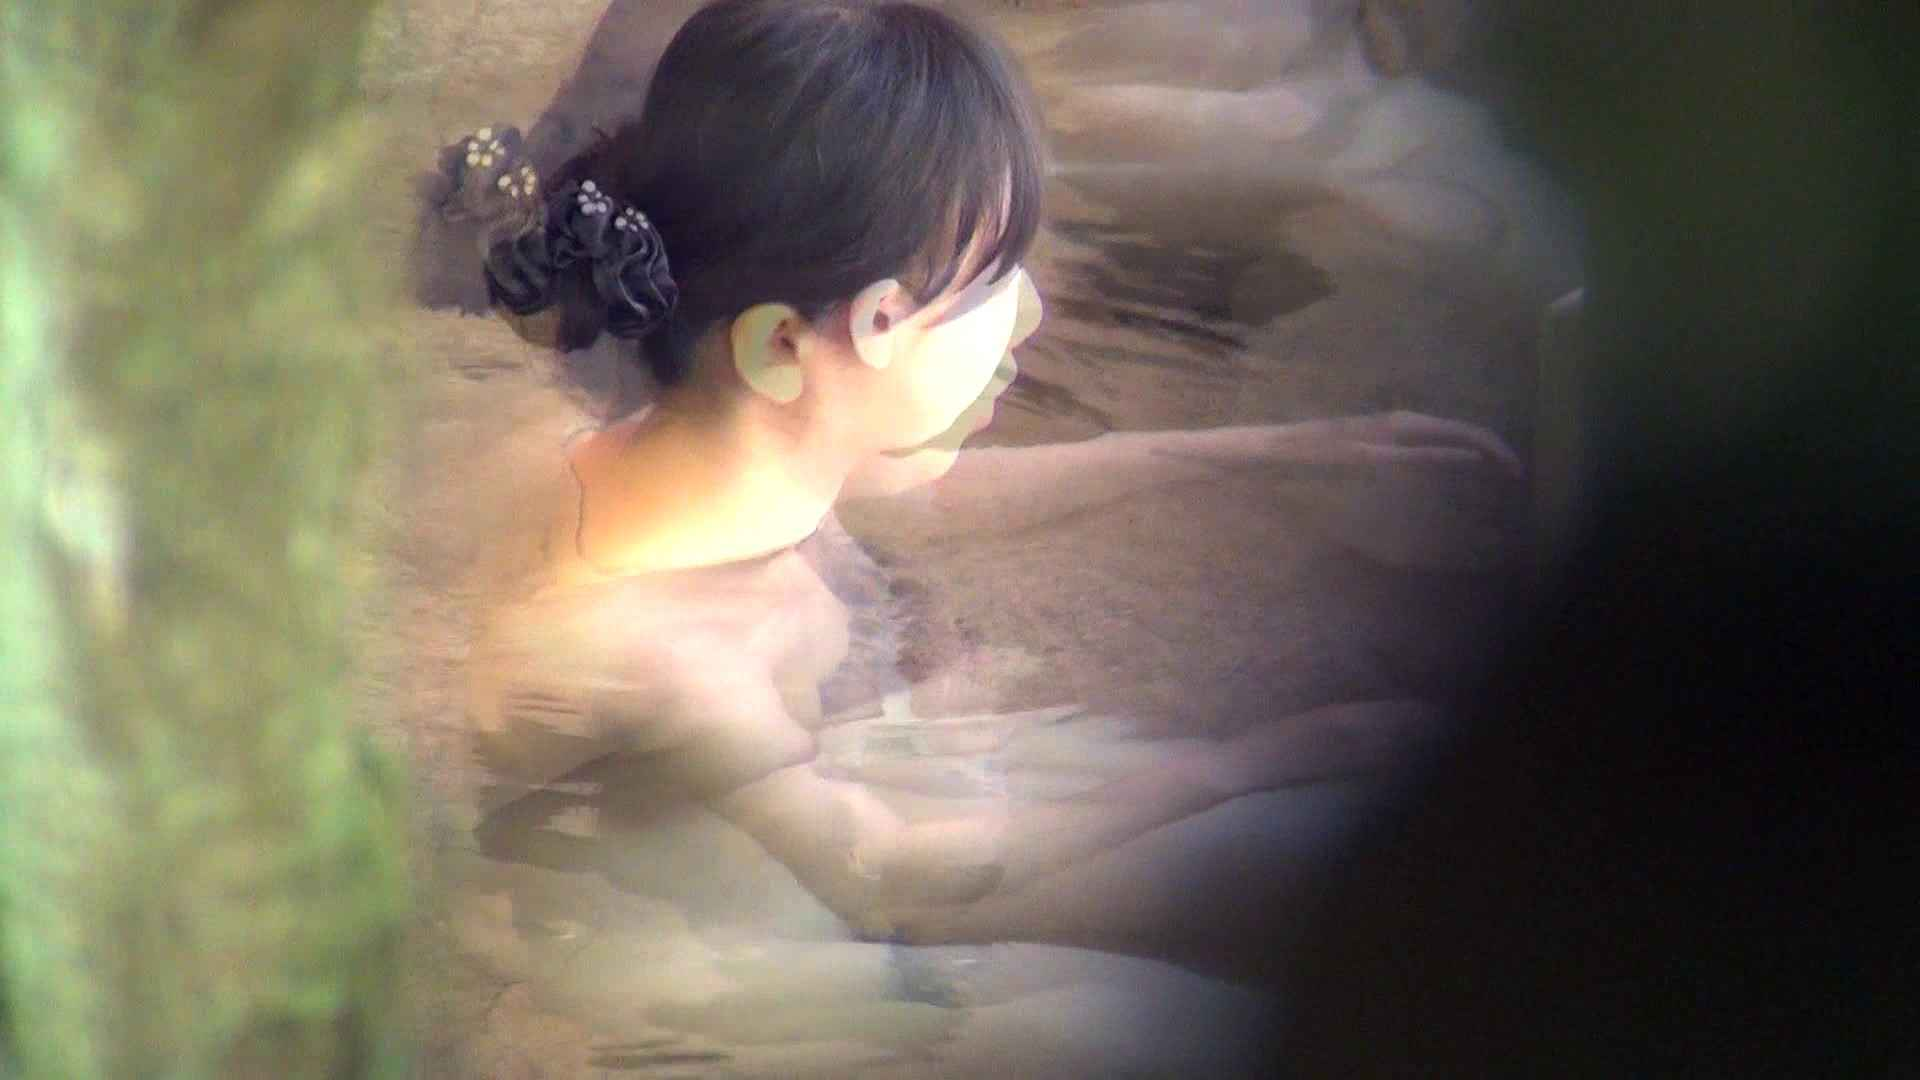 Vol.55 モッチリした肉質の色白お女市さま 桃色乳首 オメコ無修正動画無料 50画像 5